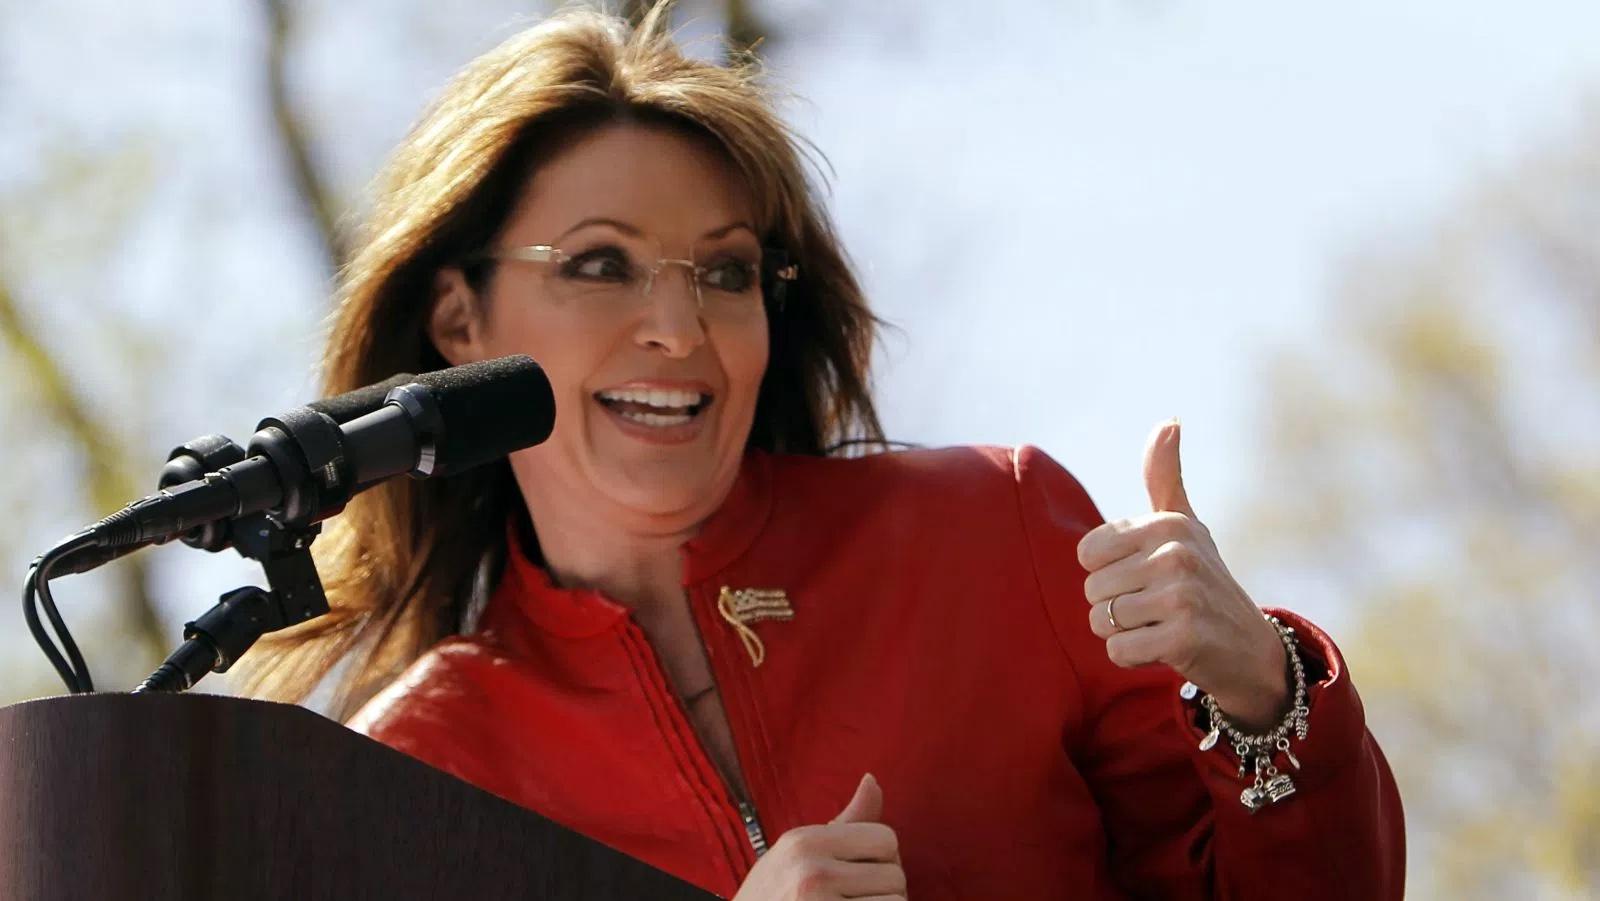 Sarah Palin, cacciatrice di alci (di Francesco Giorgioni)